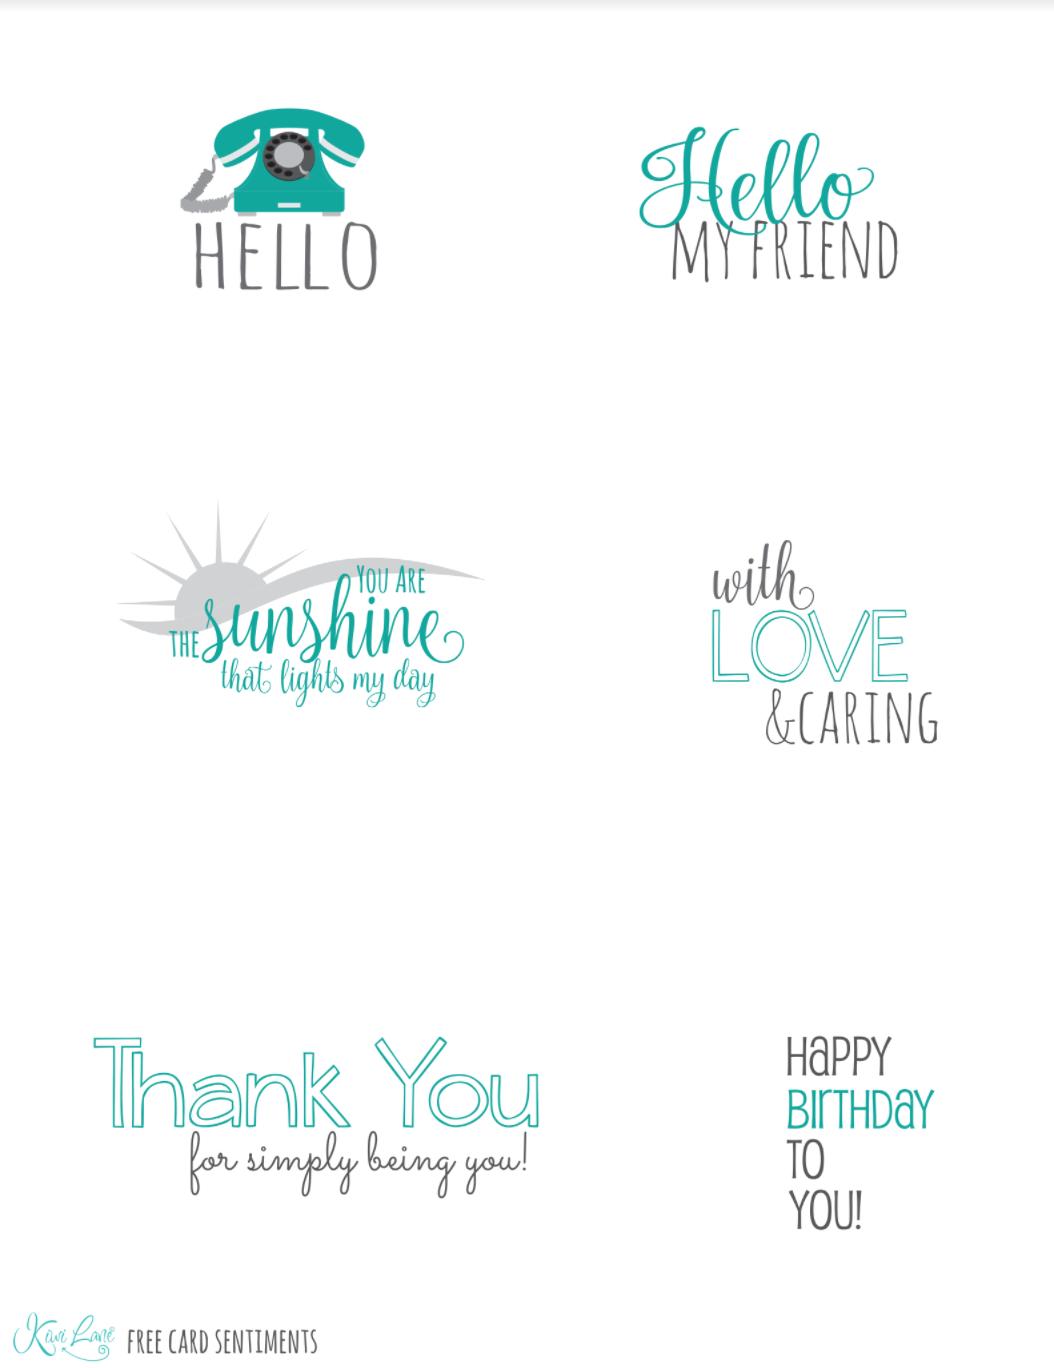 Buy 3 Get 1 Free Kwik Card Kits | Free Printables | Kiwi Lane - Free Printable Greeting Card Sentiments